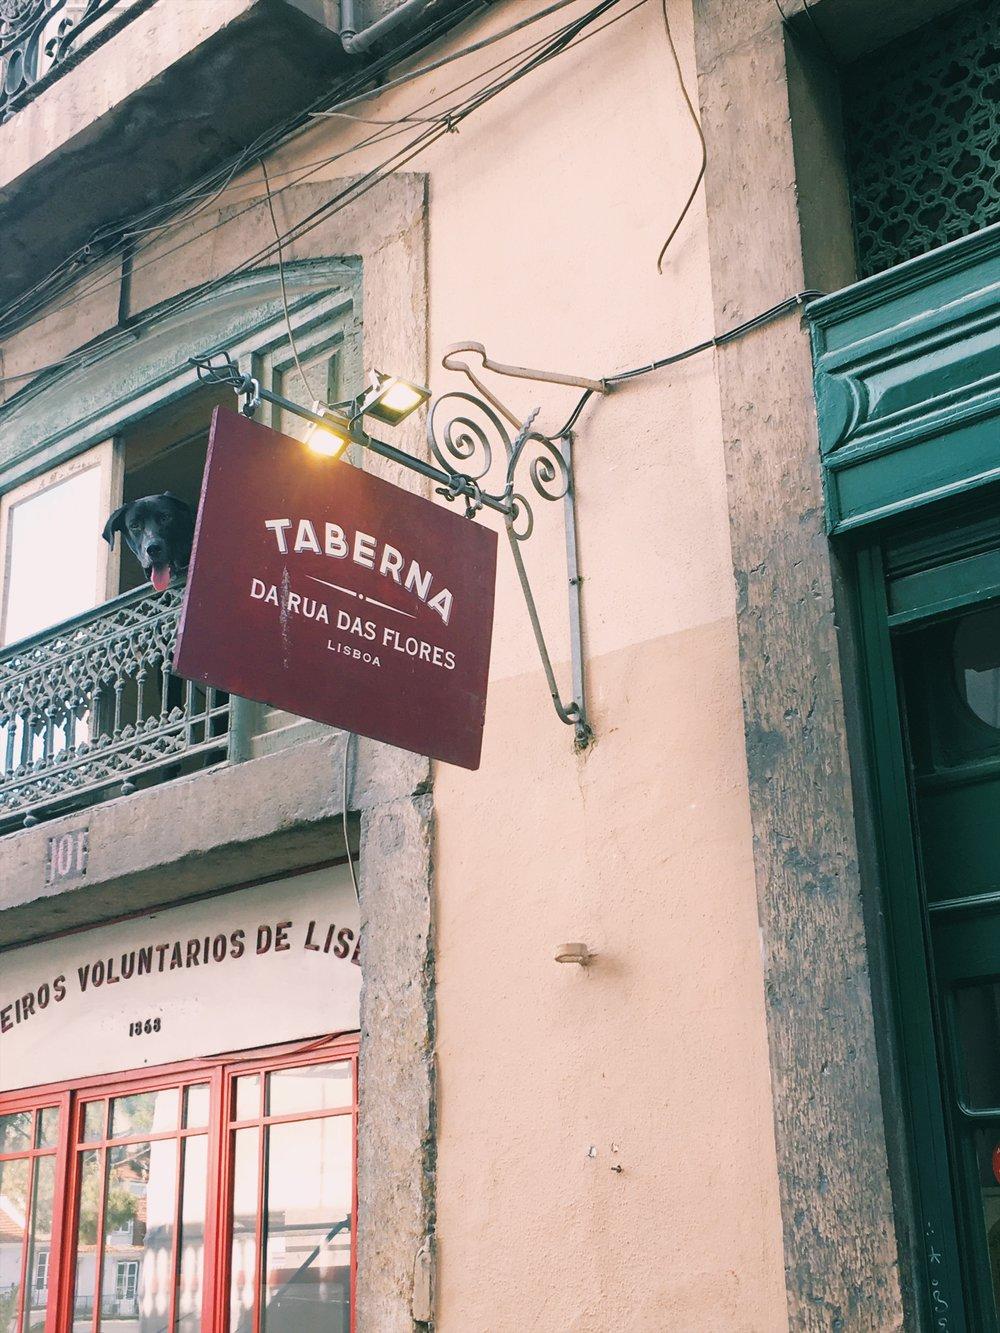 Taberna-rua-das-flores-lisbon.jpg